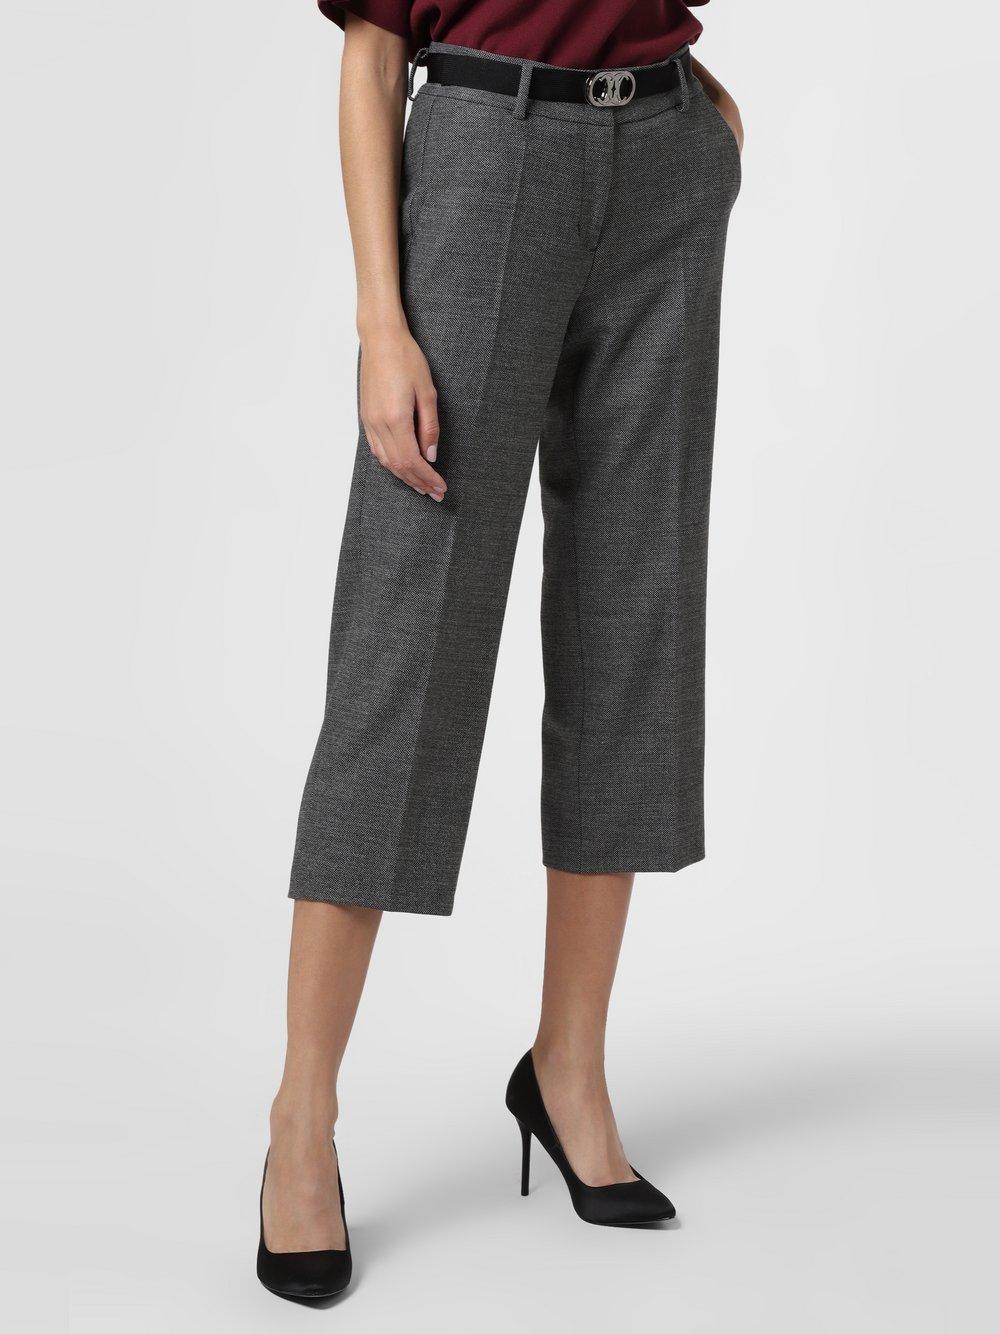 Cambio - Spodnie damskie – Claire, czarny